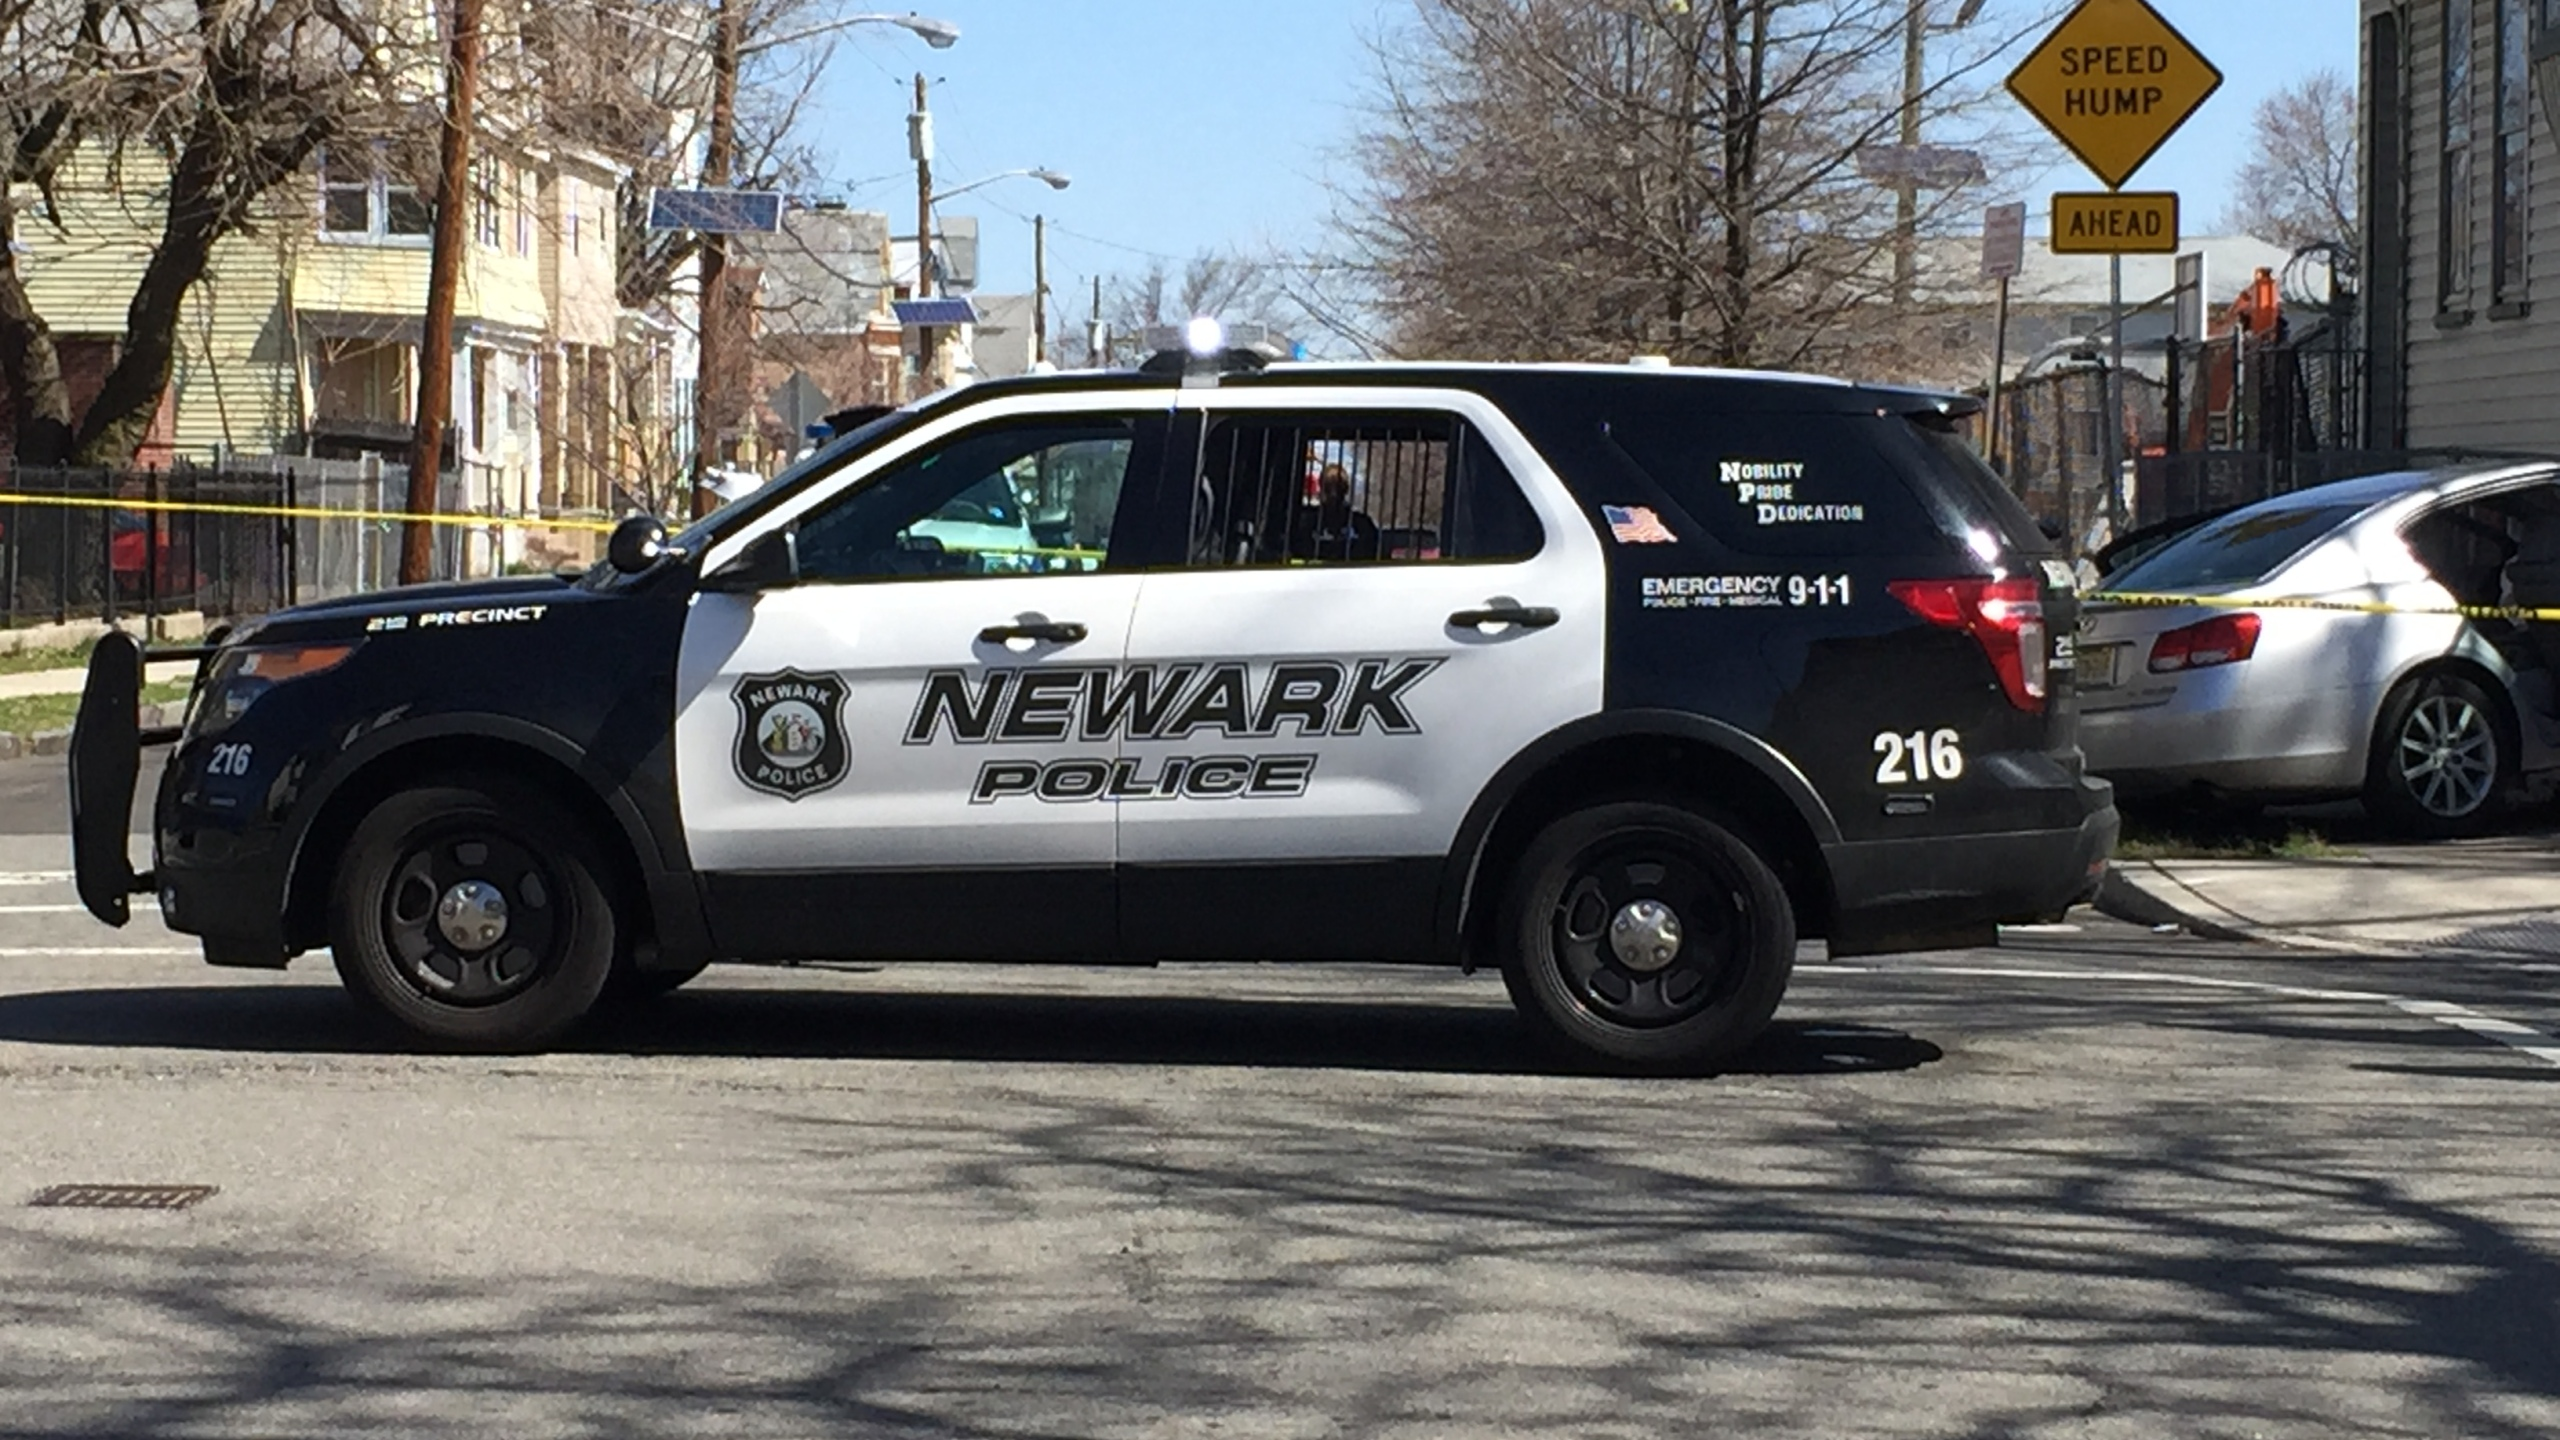 Newark police vehicle